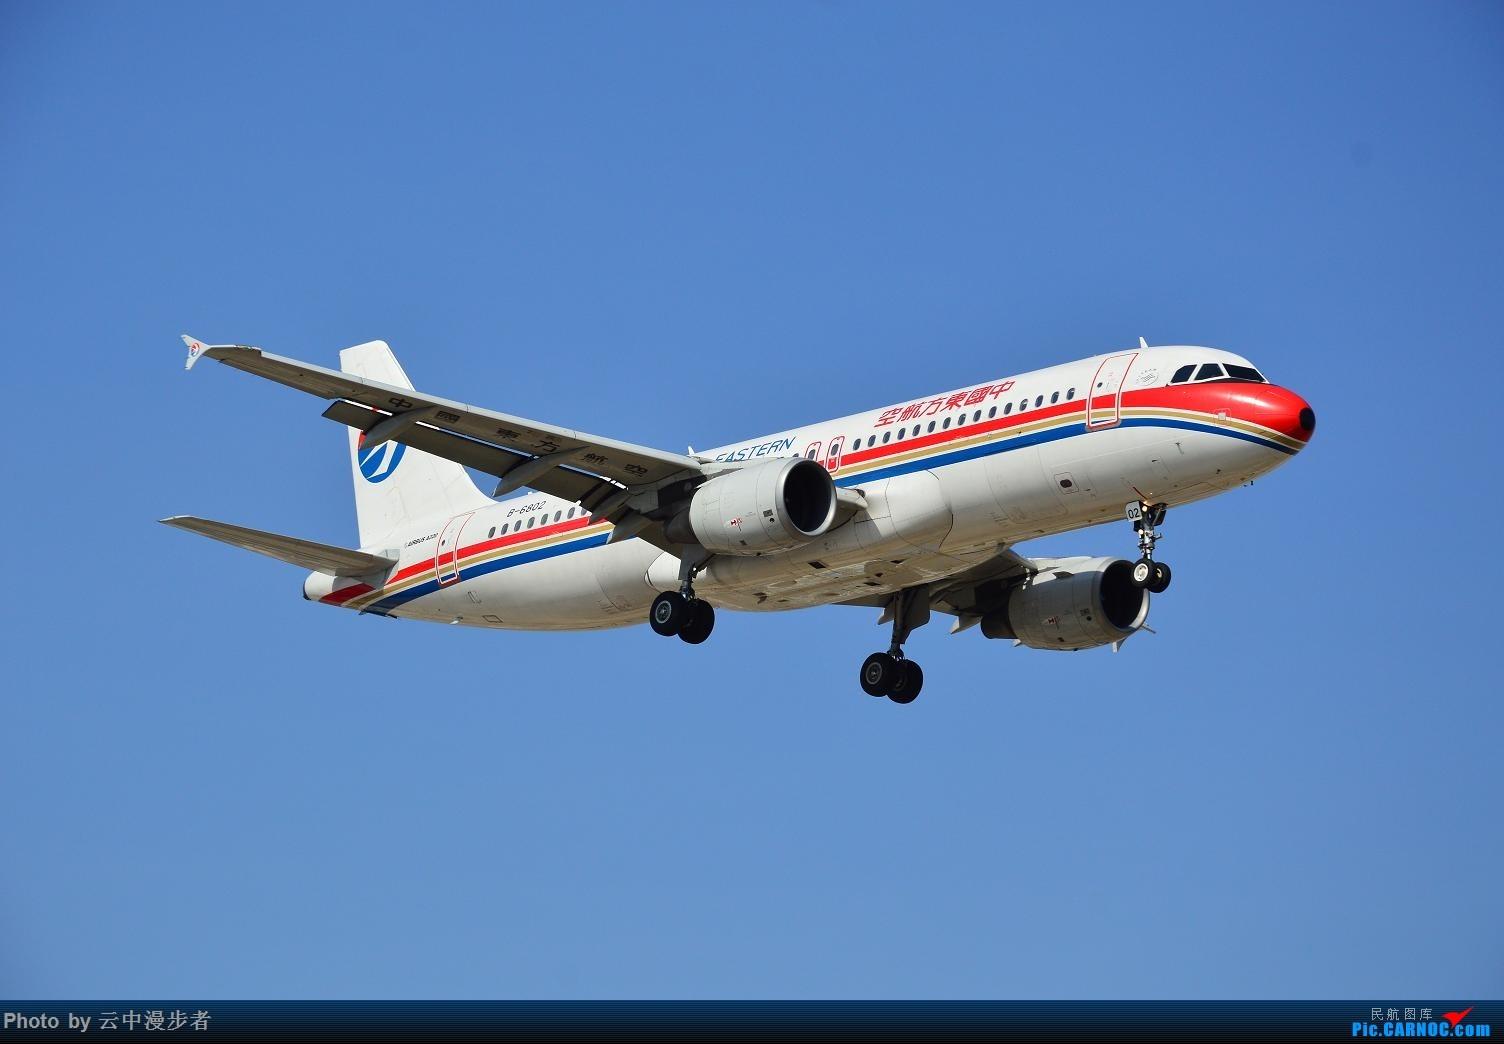 Re:[原创]好天就是好货,拍什么都好看 AIRBUS A320-200 B-6802 中国厦门高崎国际机场